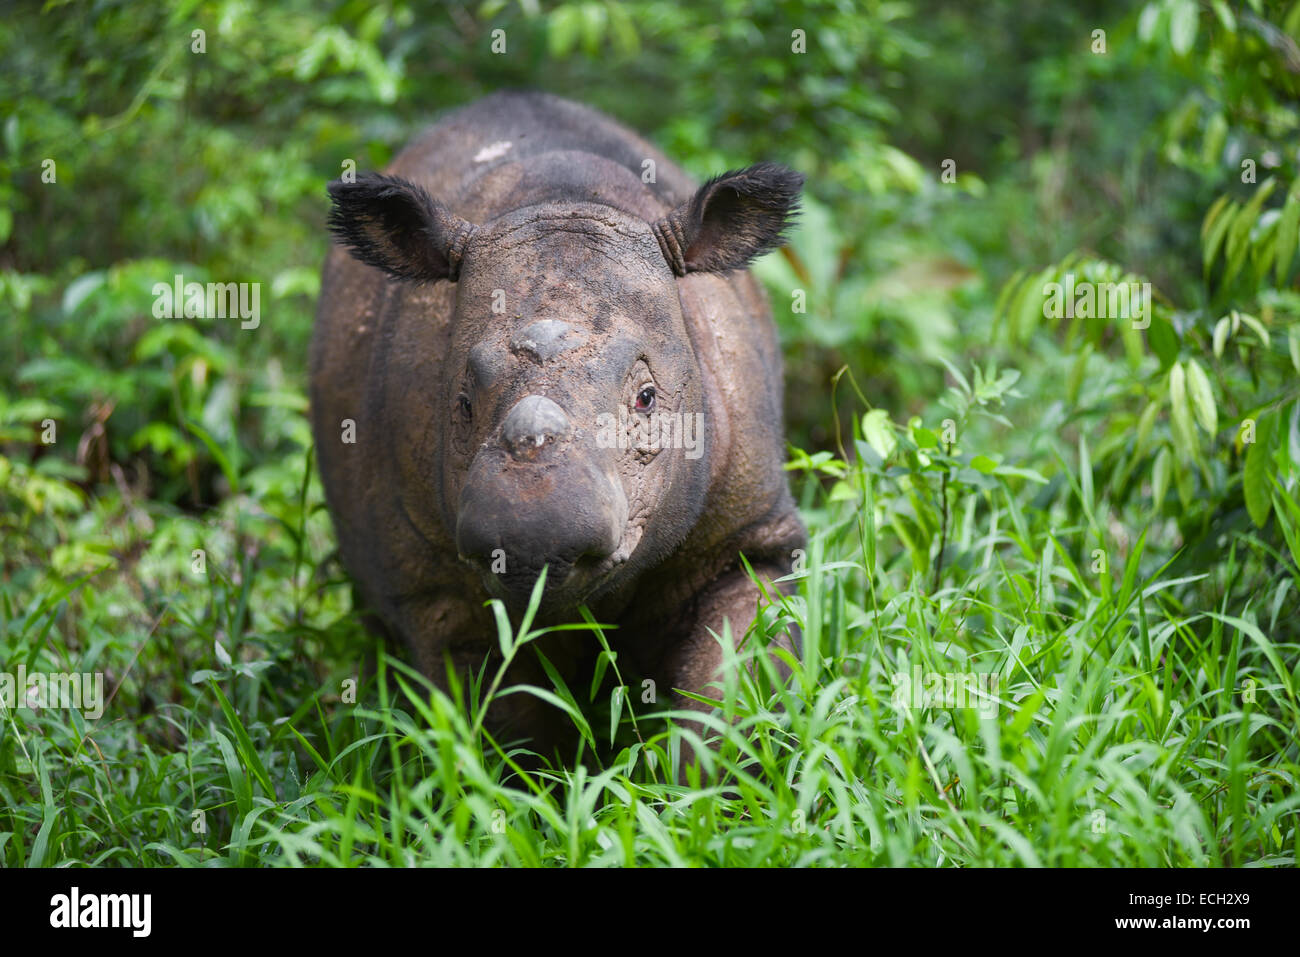 Andatu, the first Sumatran rhinoceros born in captivity in Indonesia. © Reynold Sumayku - Stock Image